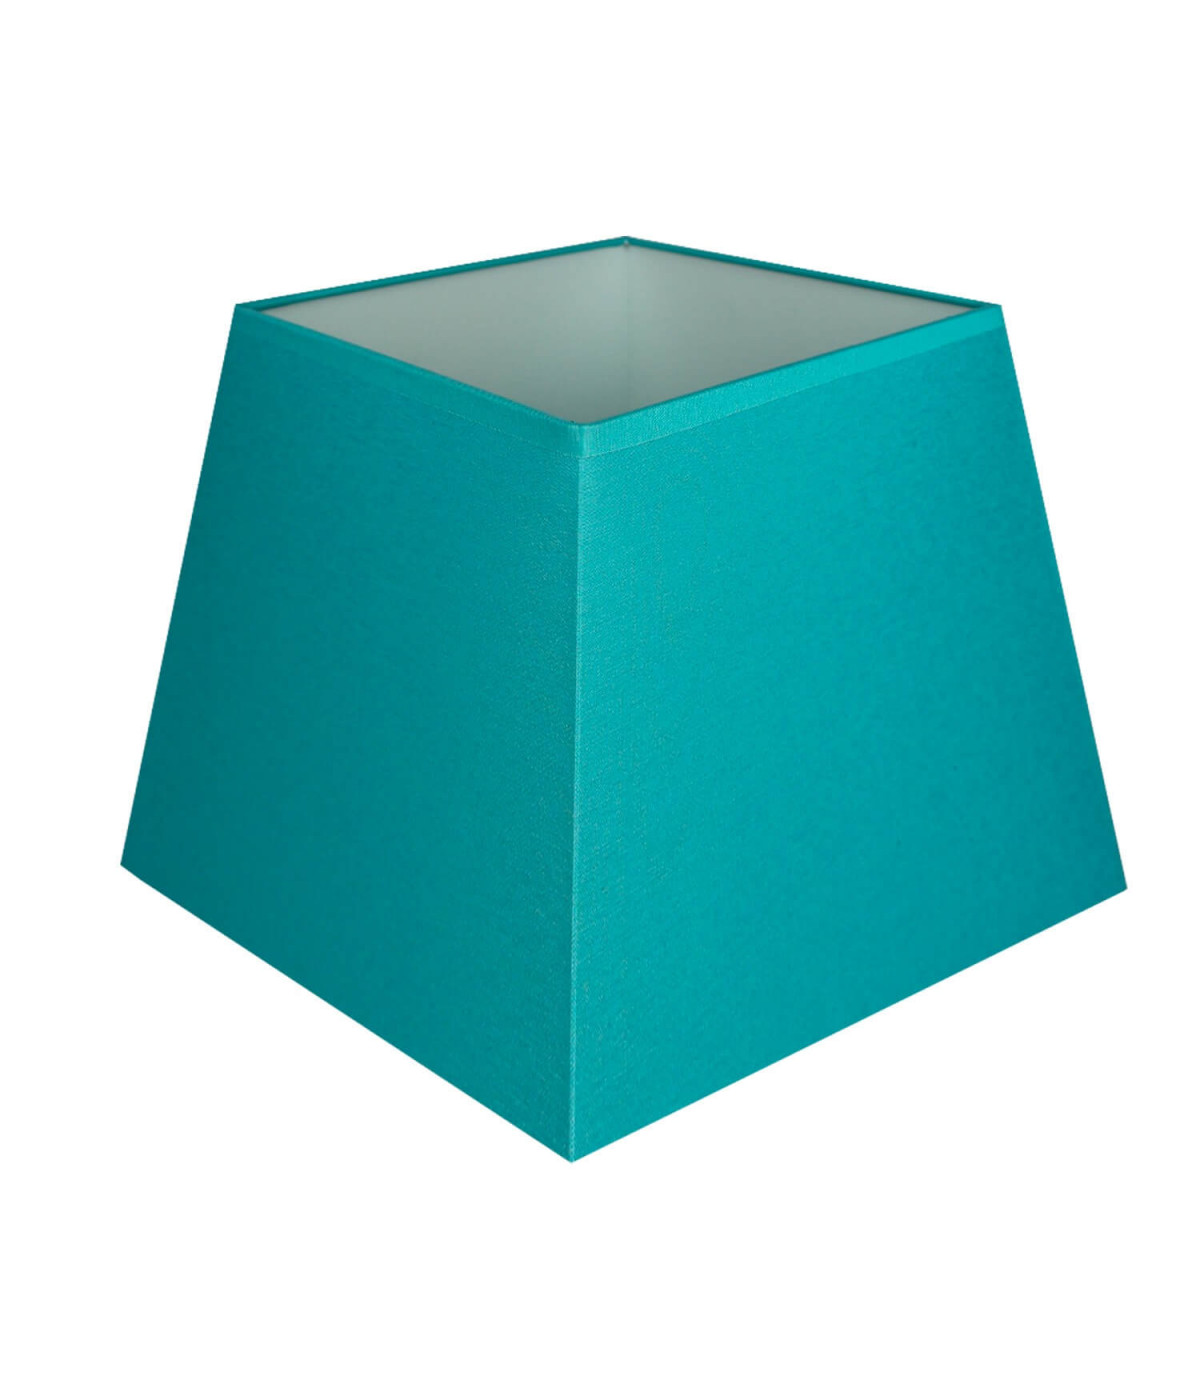 Abat-jour carre pyramidal Bleu turquoise